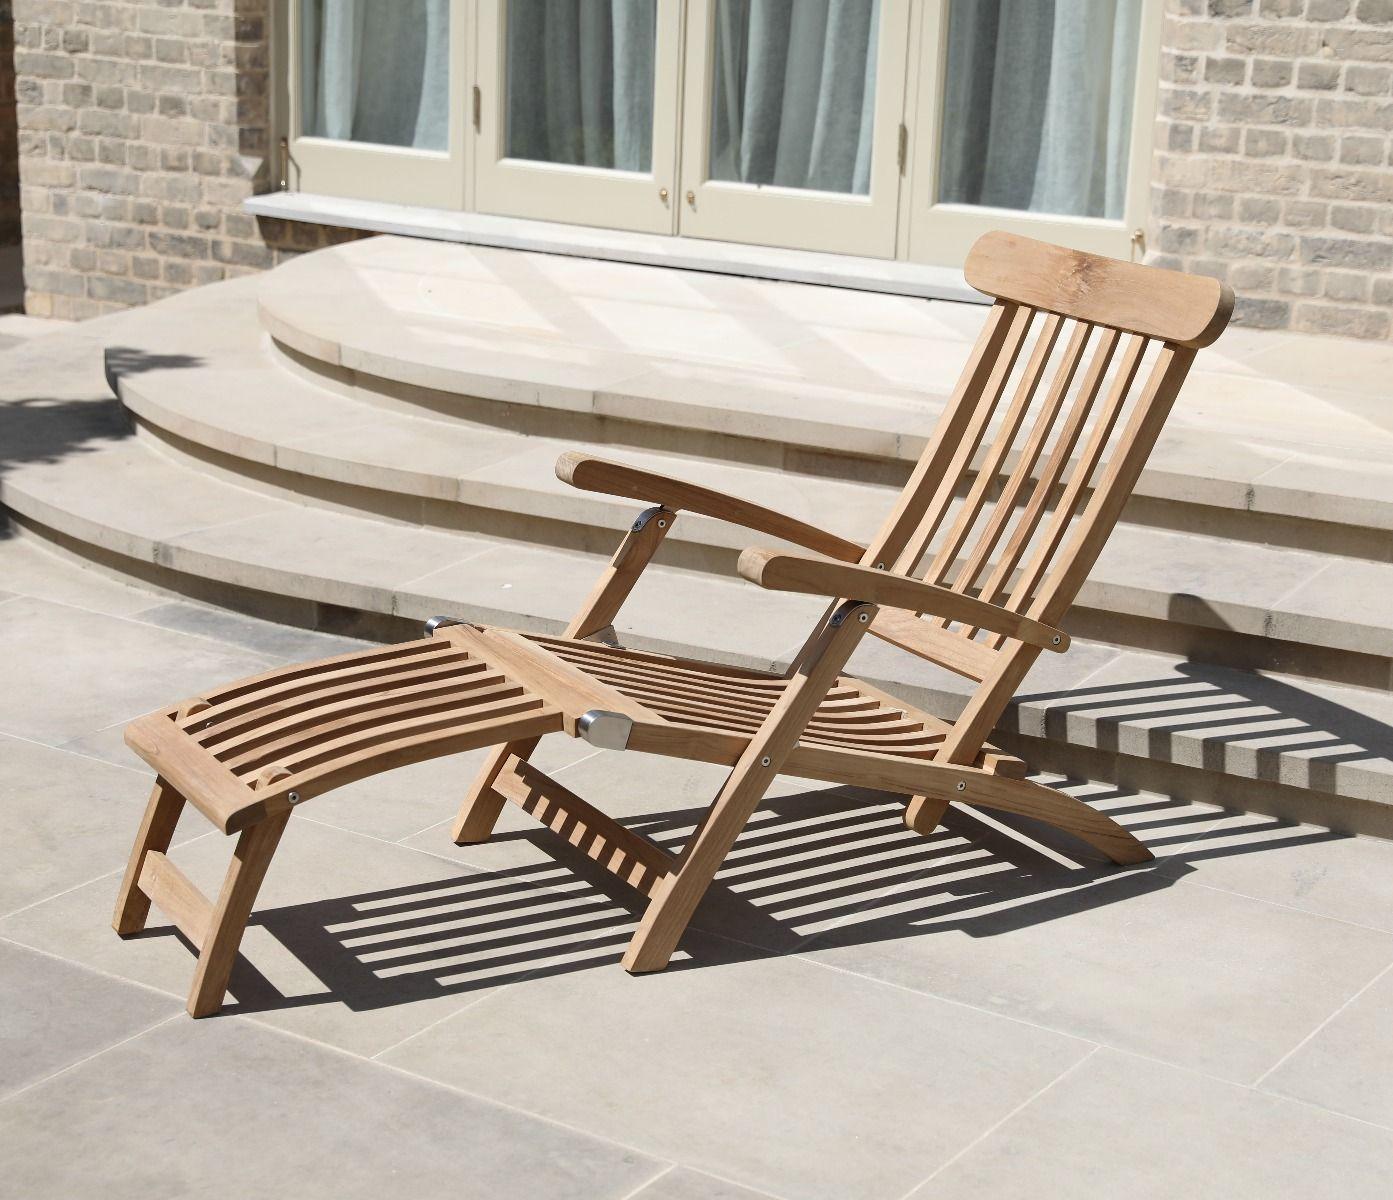 teak steamer chair gym setup wooden jo alexander